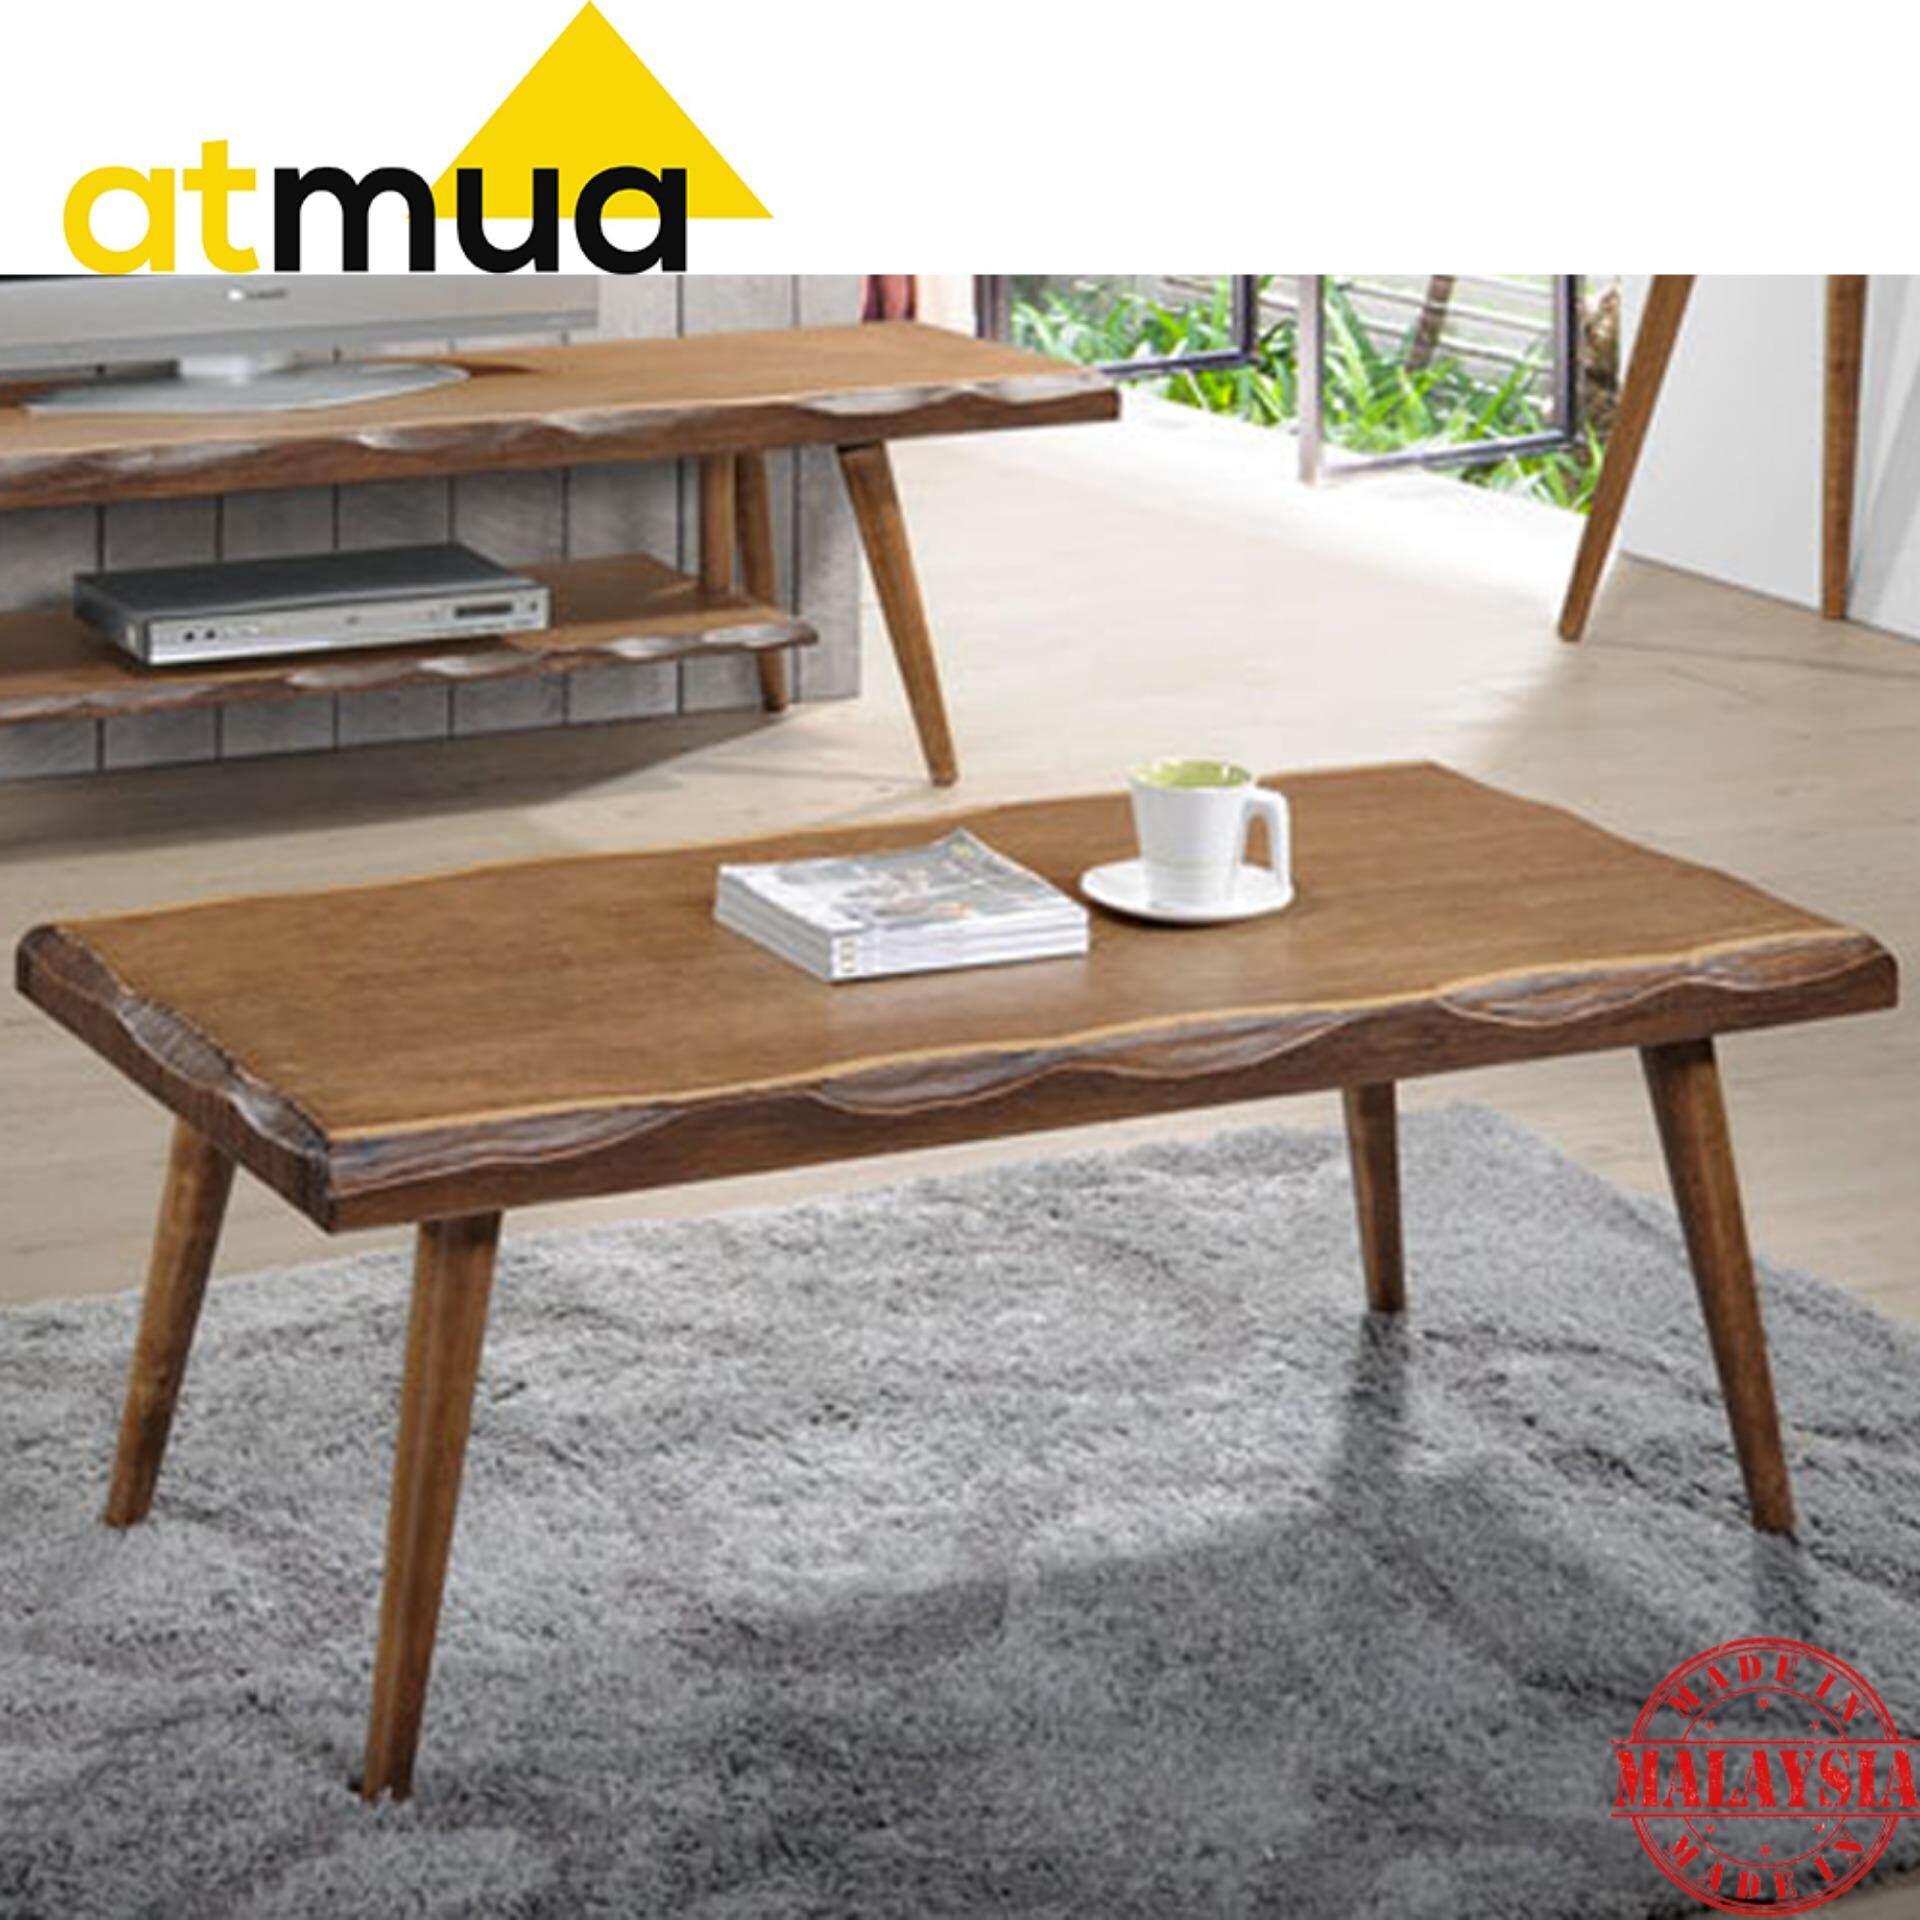 [Promotion] Atmua Log Coffee Table (4 Feet) [Veneer with Wooden Leg]